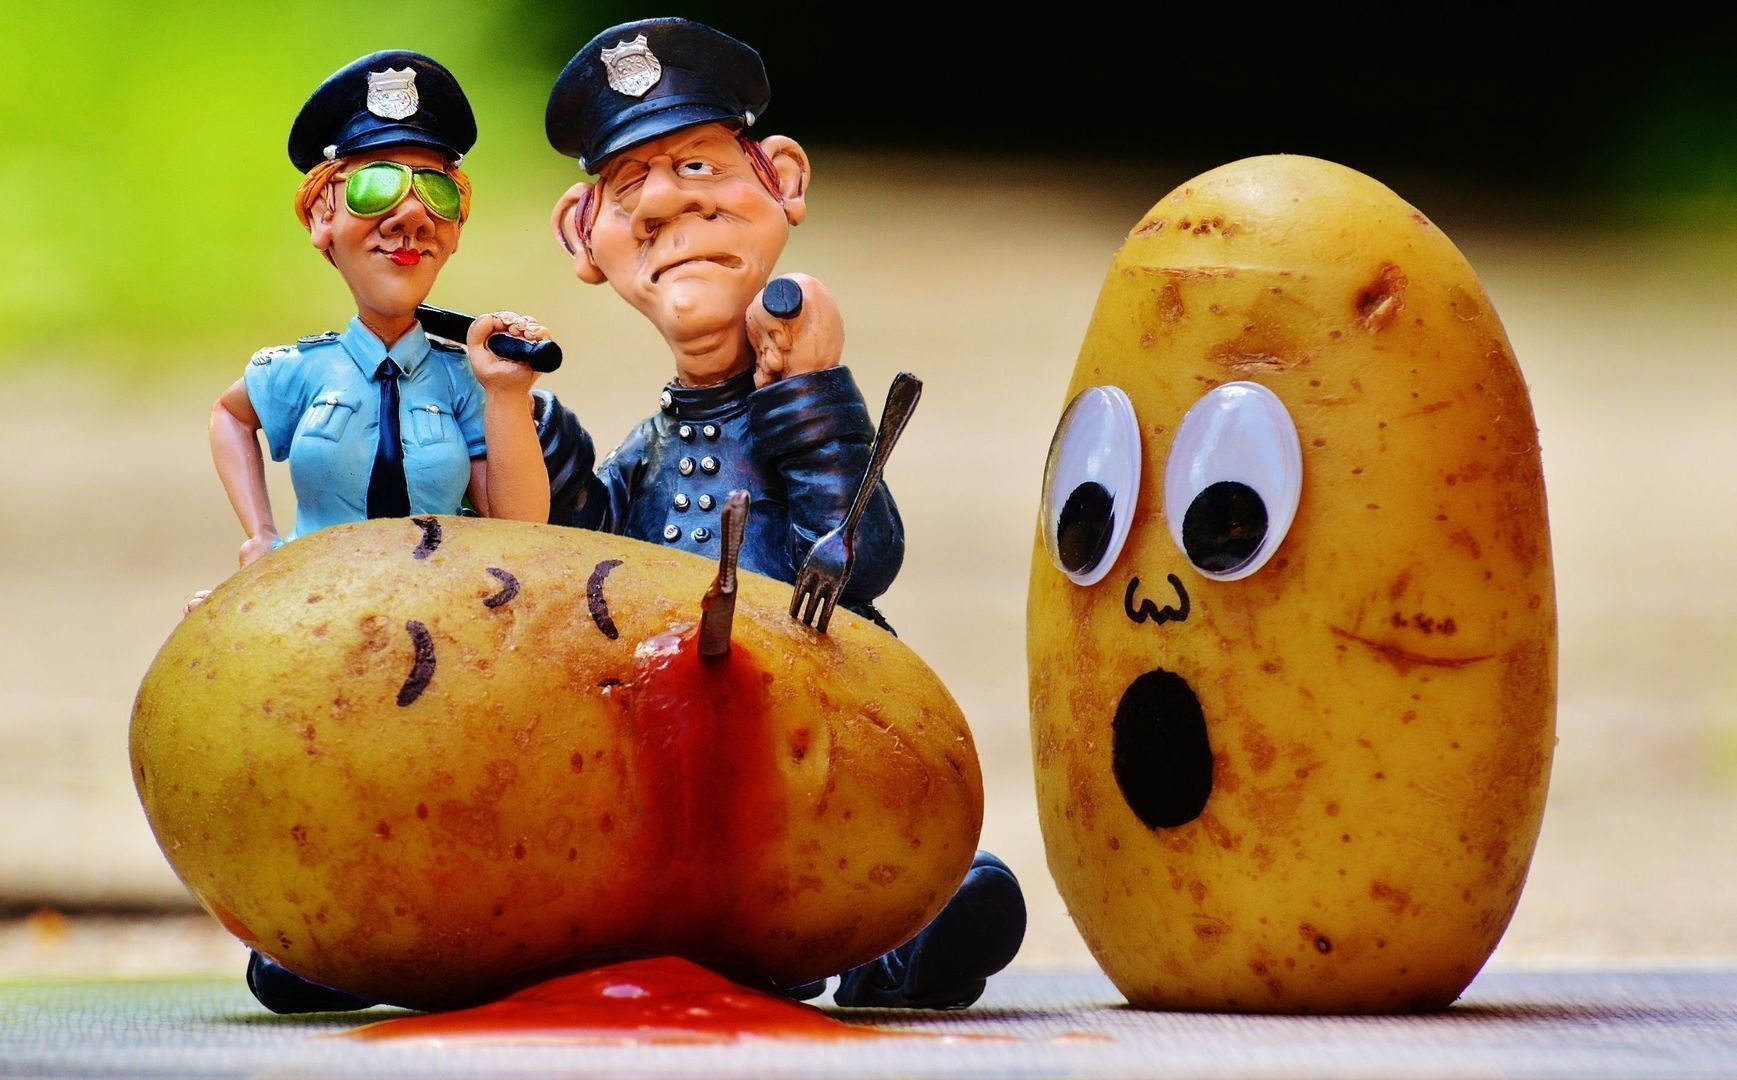 Politia prostituata